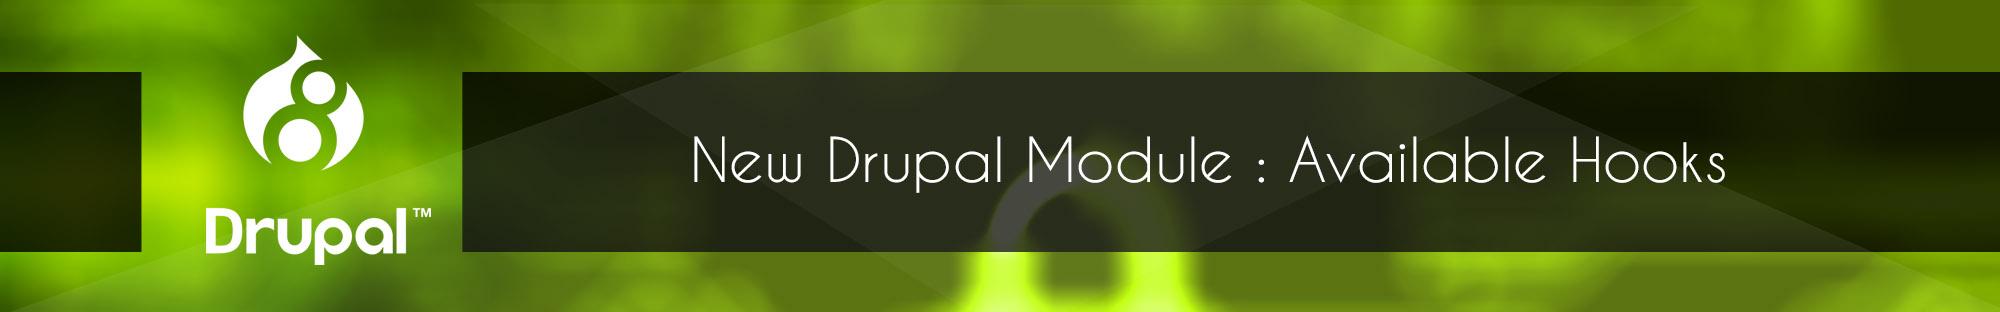 New Drupal Module Available Hooks